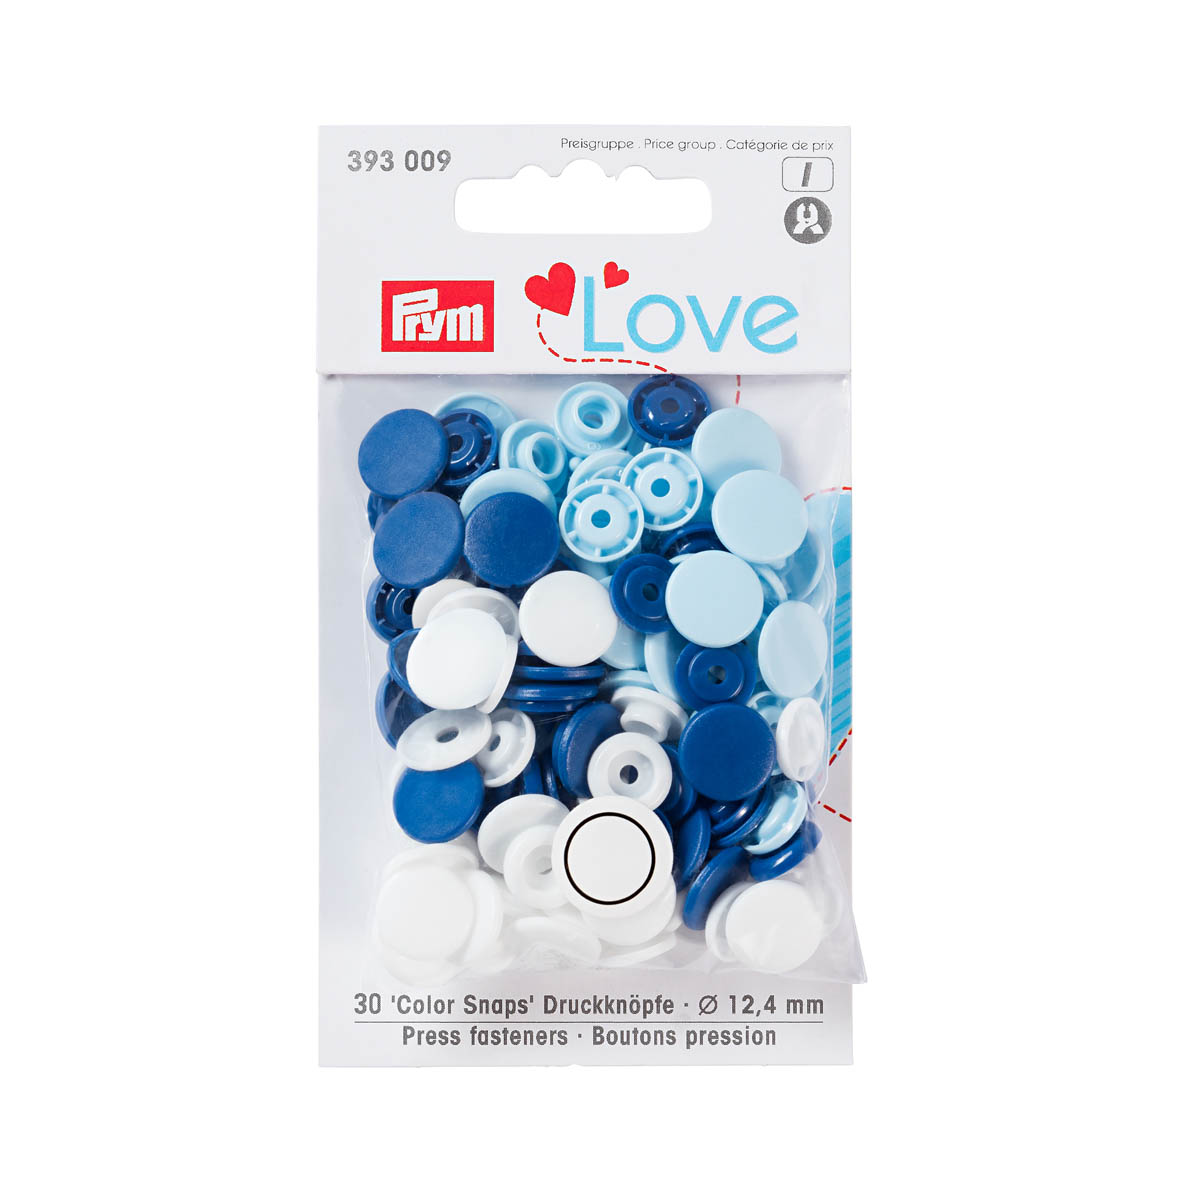 393009 Kнопки Color Snaps PrymLove, синий/голубой/белый цв., 12мм, 30шт Prym